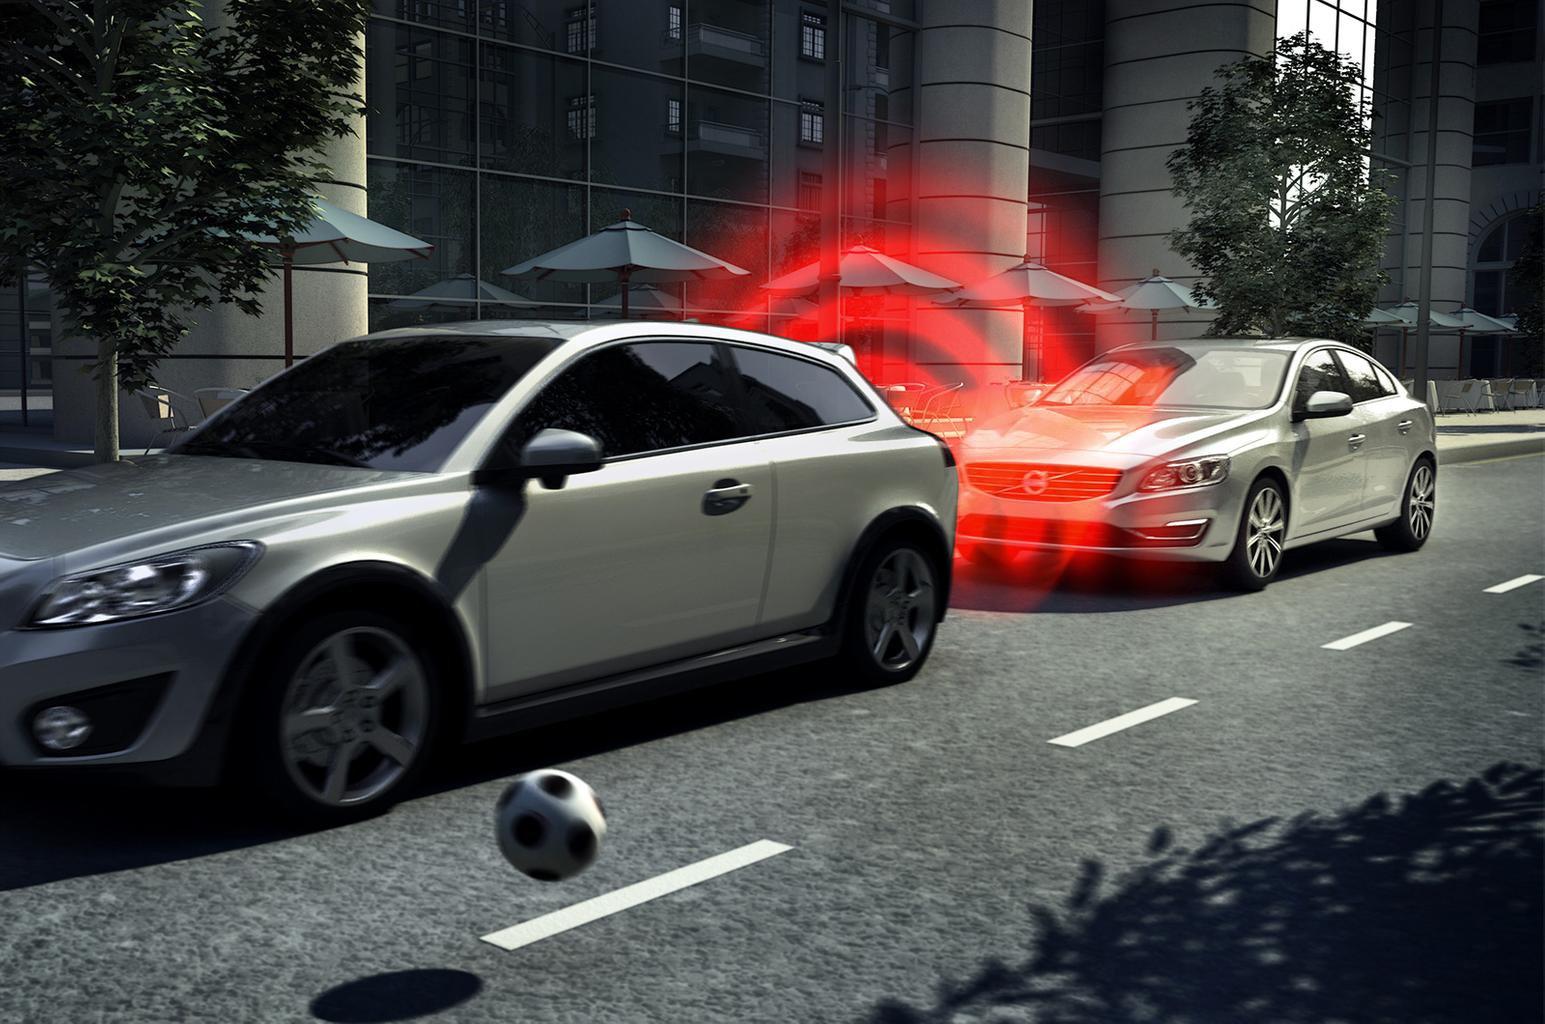 European Parliament demands better safety for cars